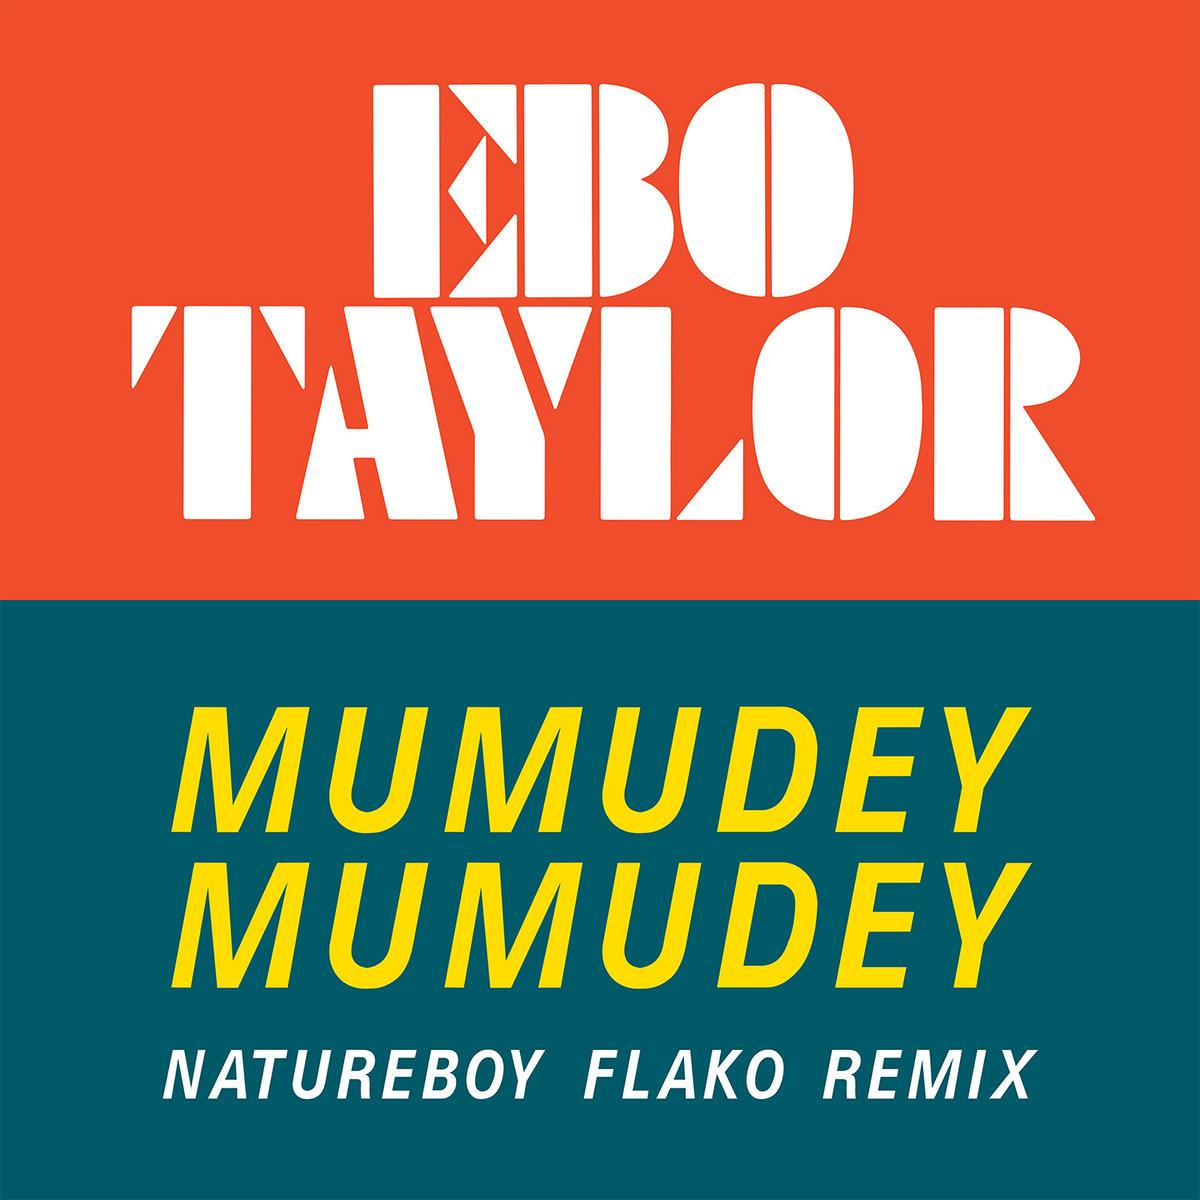 Mumudey Mumudey (Natureboy Flako Remix) | Ebo Taylor